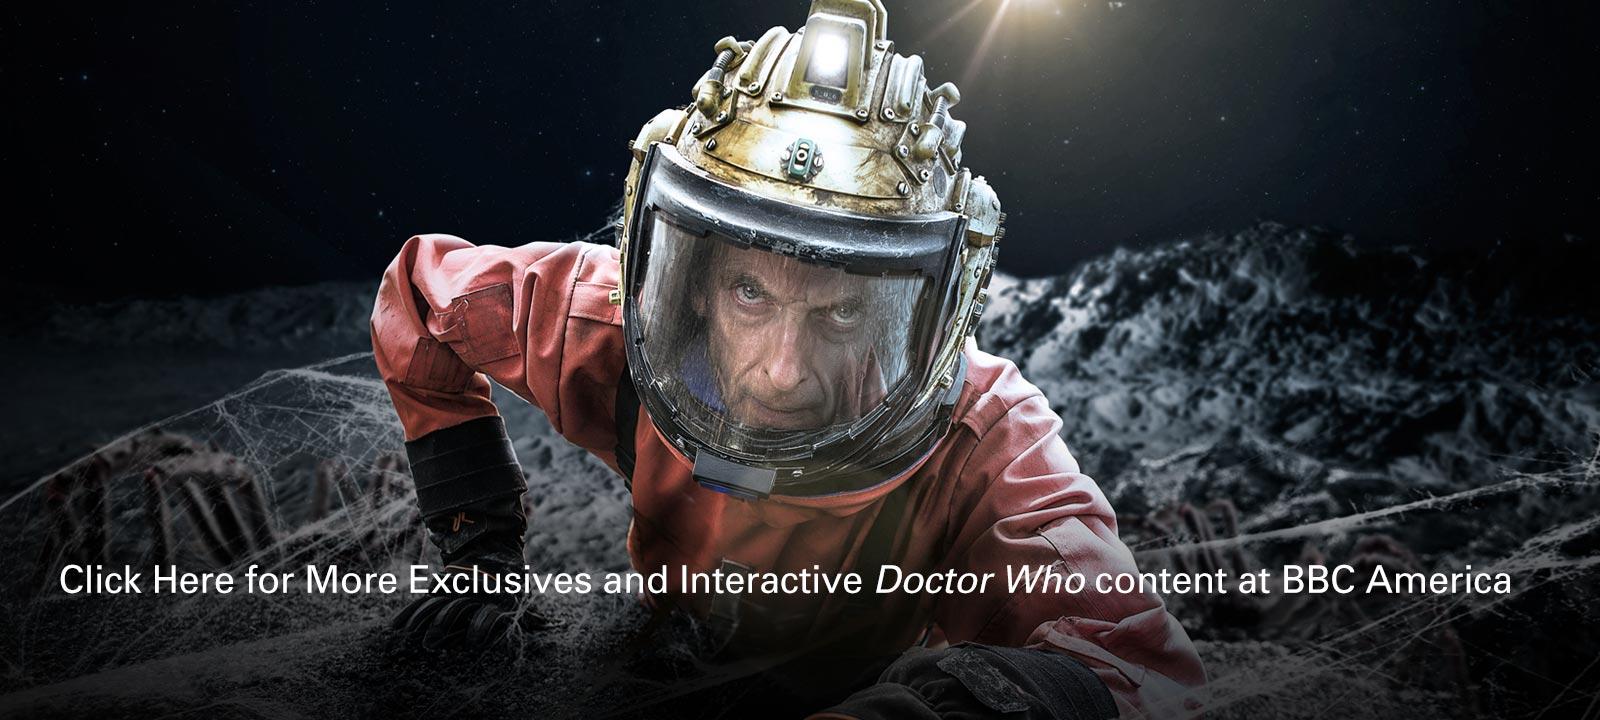 doctor-who-iconic-episode-807-doctor-capaldi-800×600-bbc